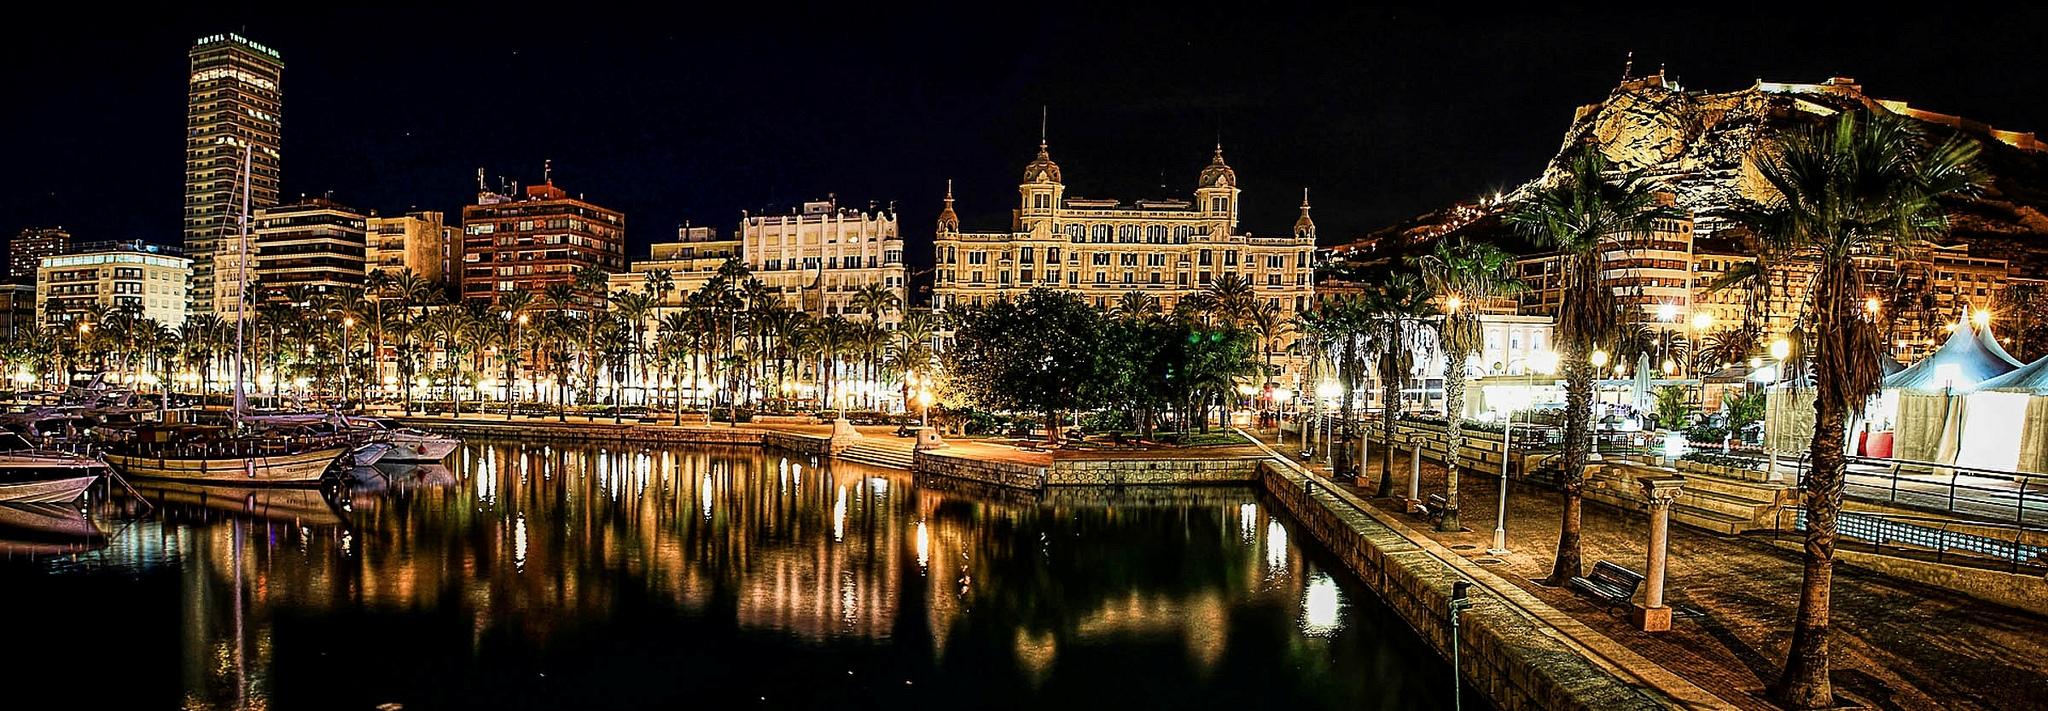 Alicante.original.Spain